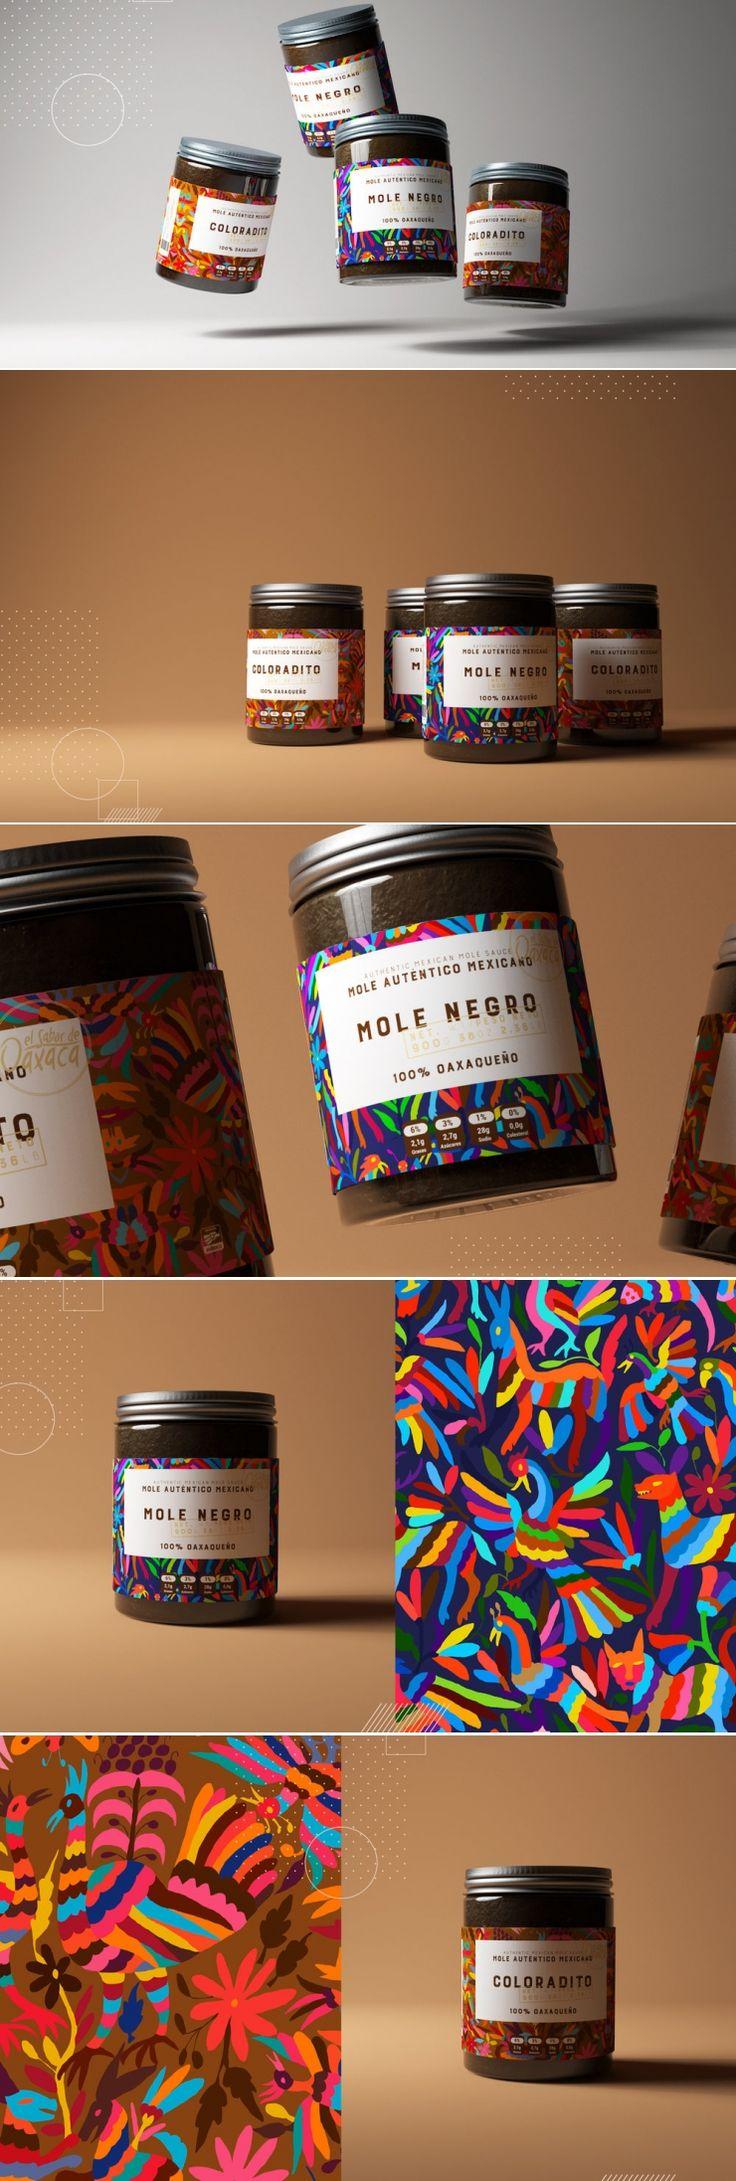 Sabor de Oaxaca Mole Sauce — The Dieline - Branding & Packaging Design